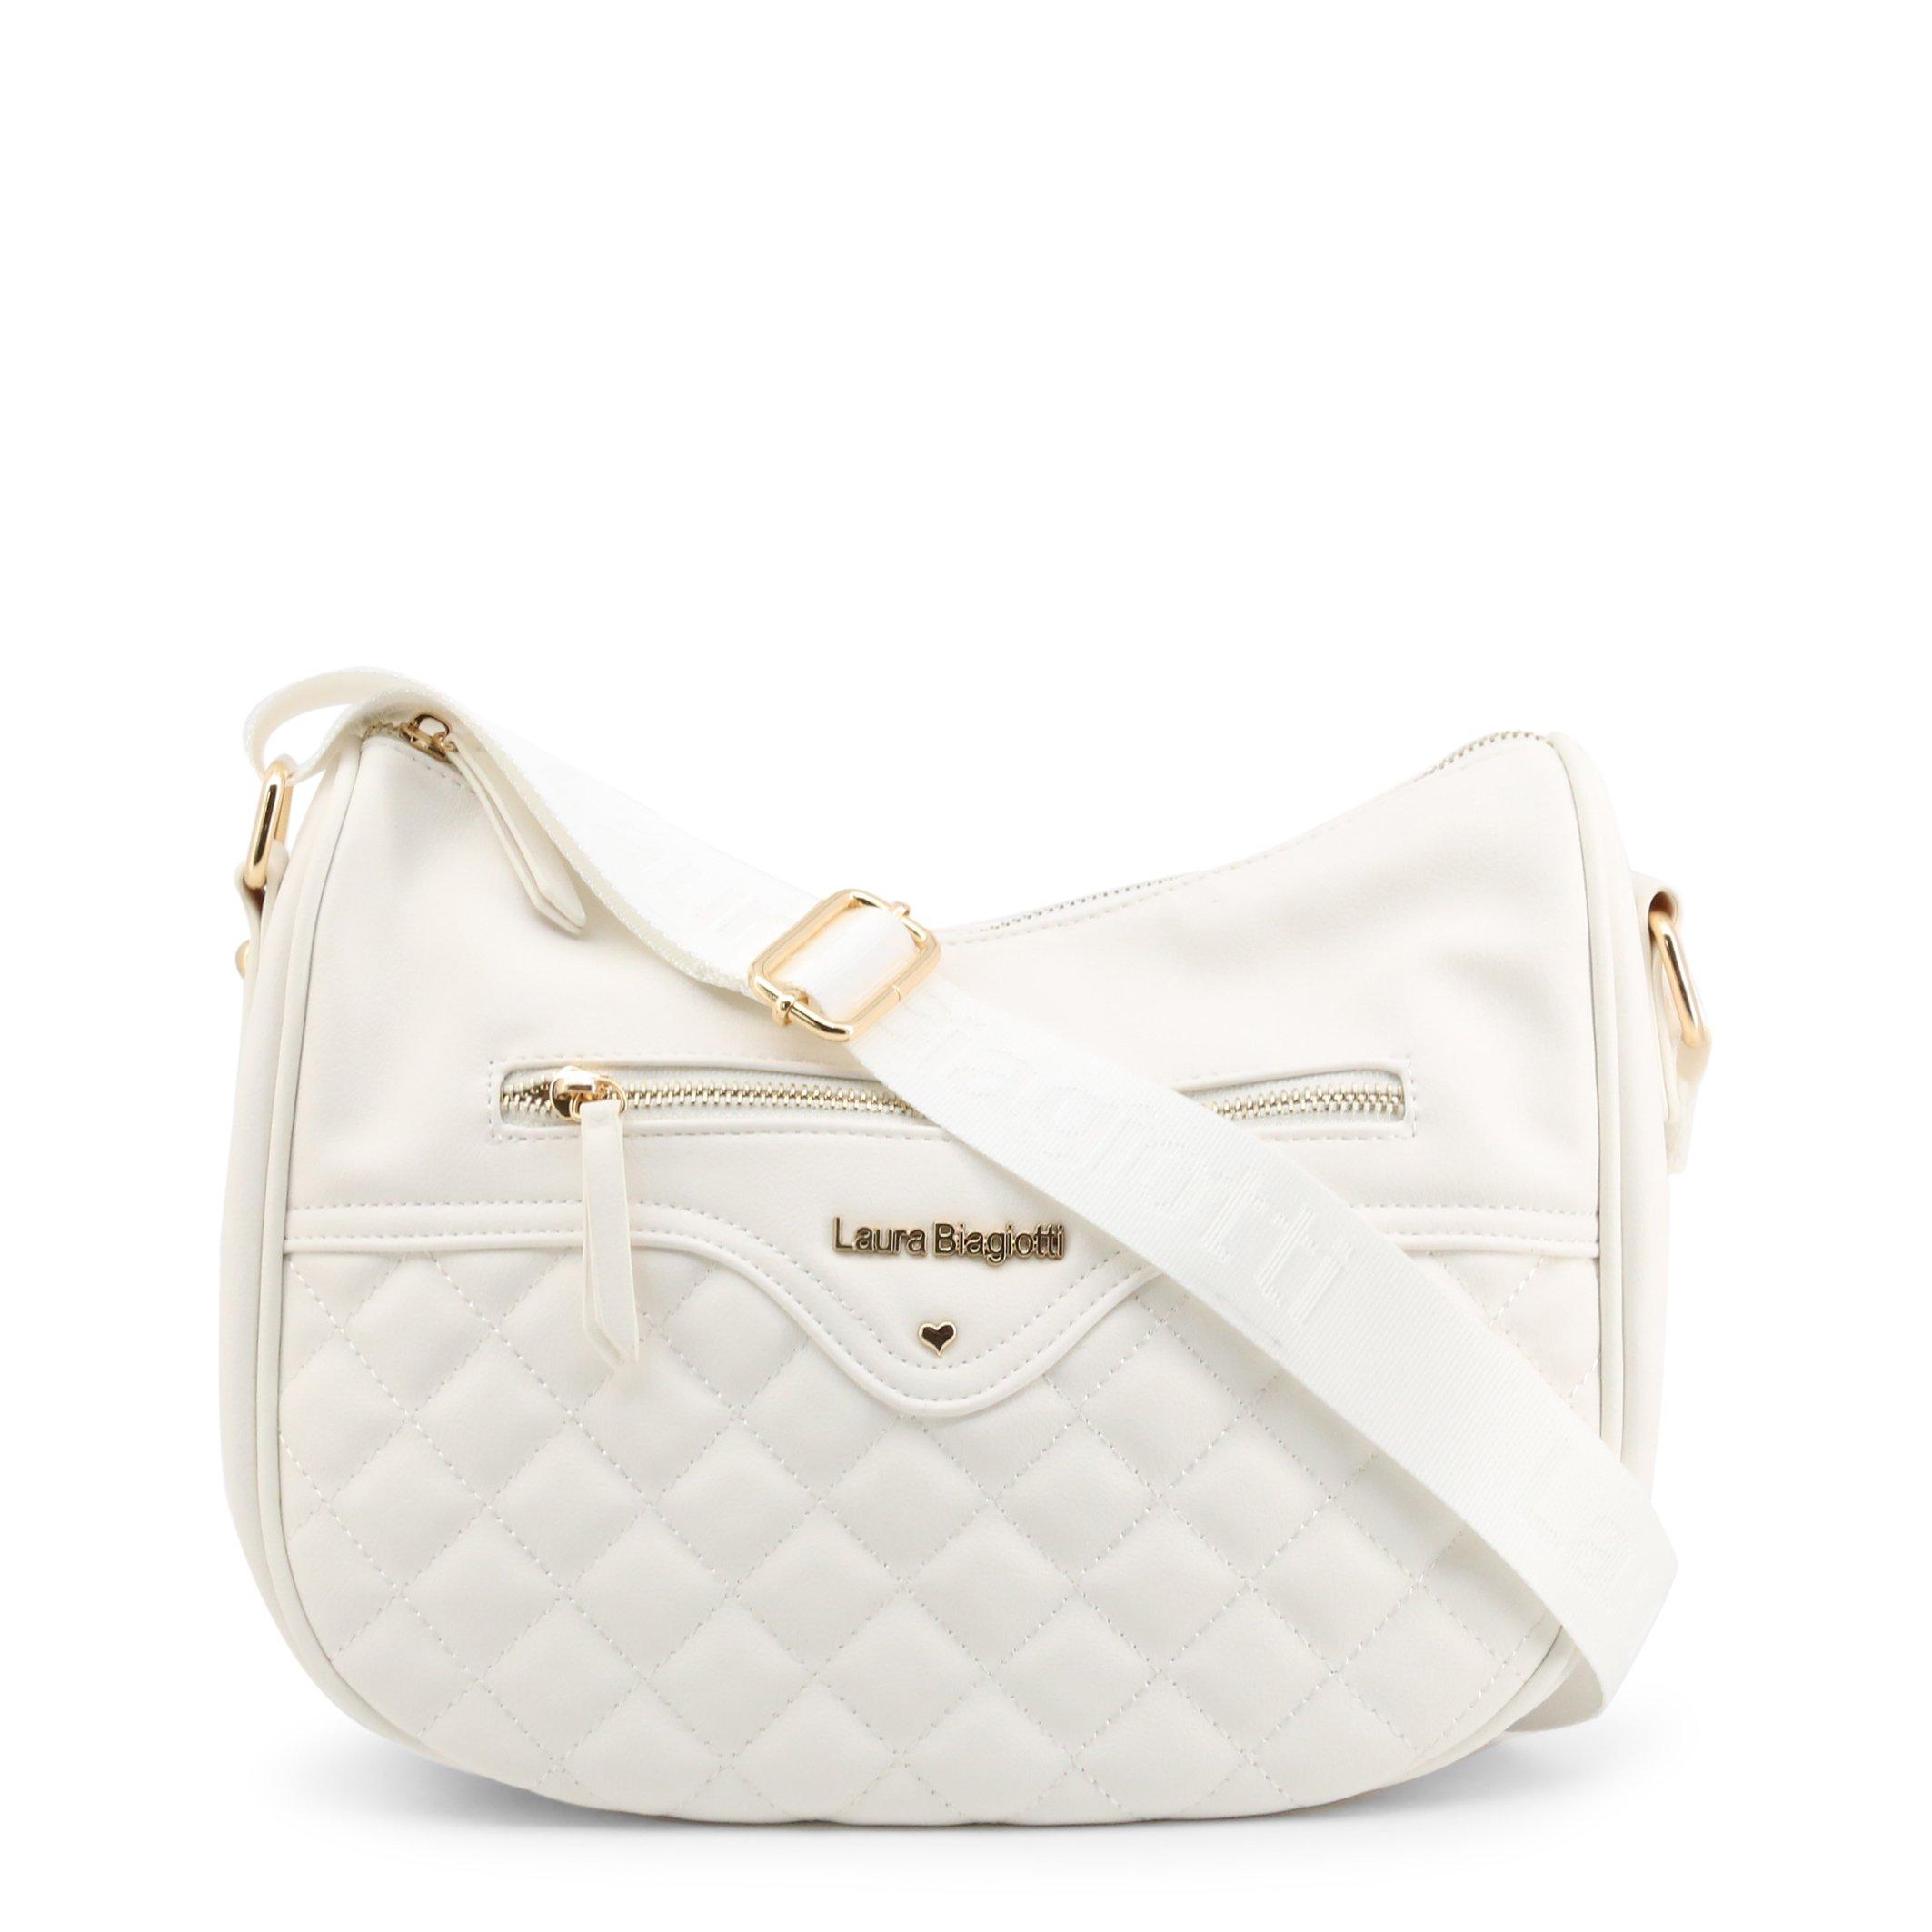 Laura Biagiotti Women's Crossbody Bag Various Colours Perkins-102-1 - white NOSIZE